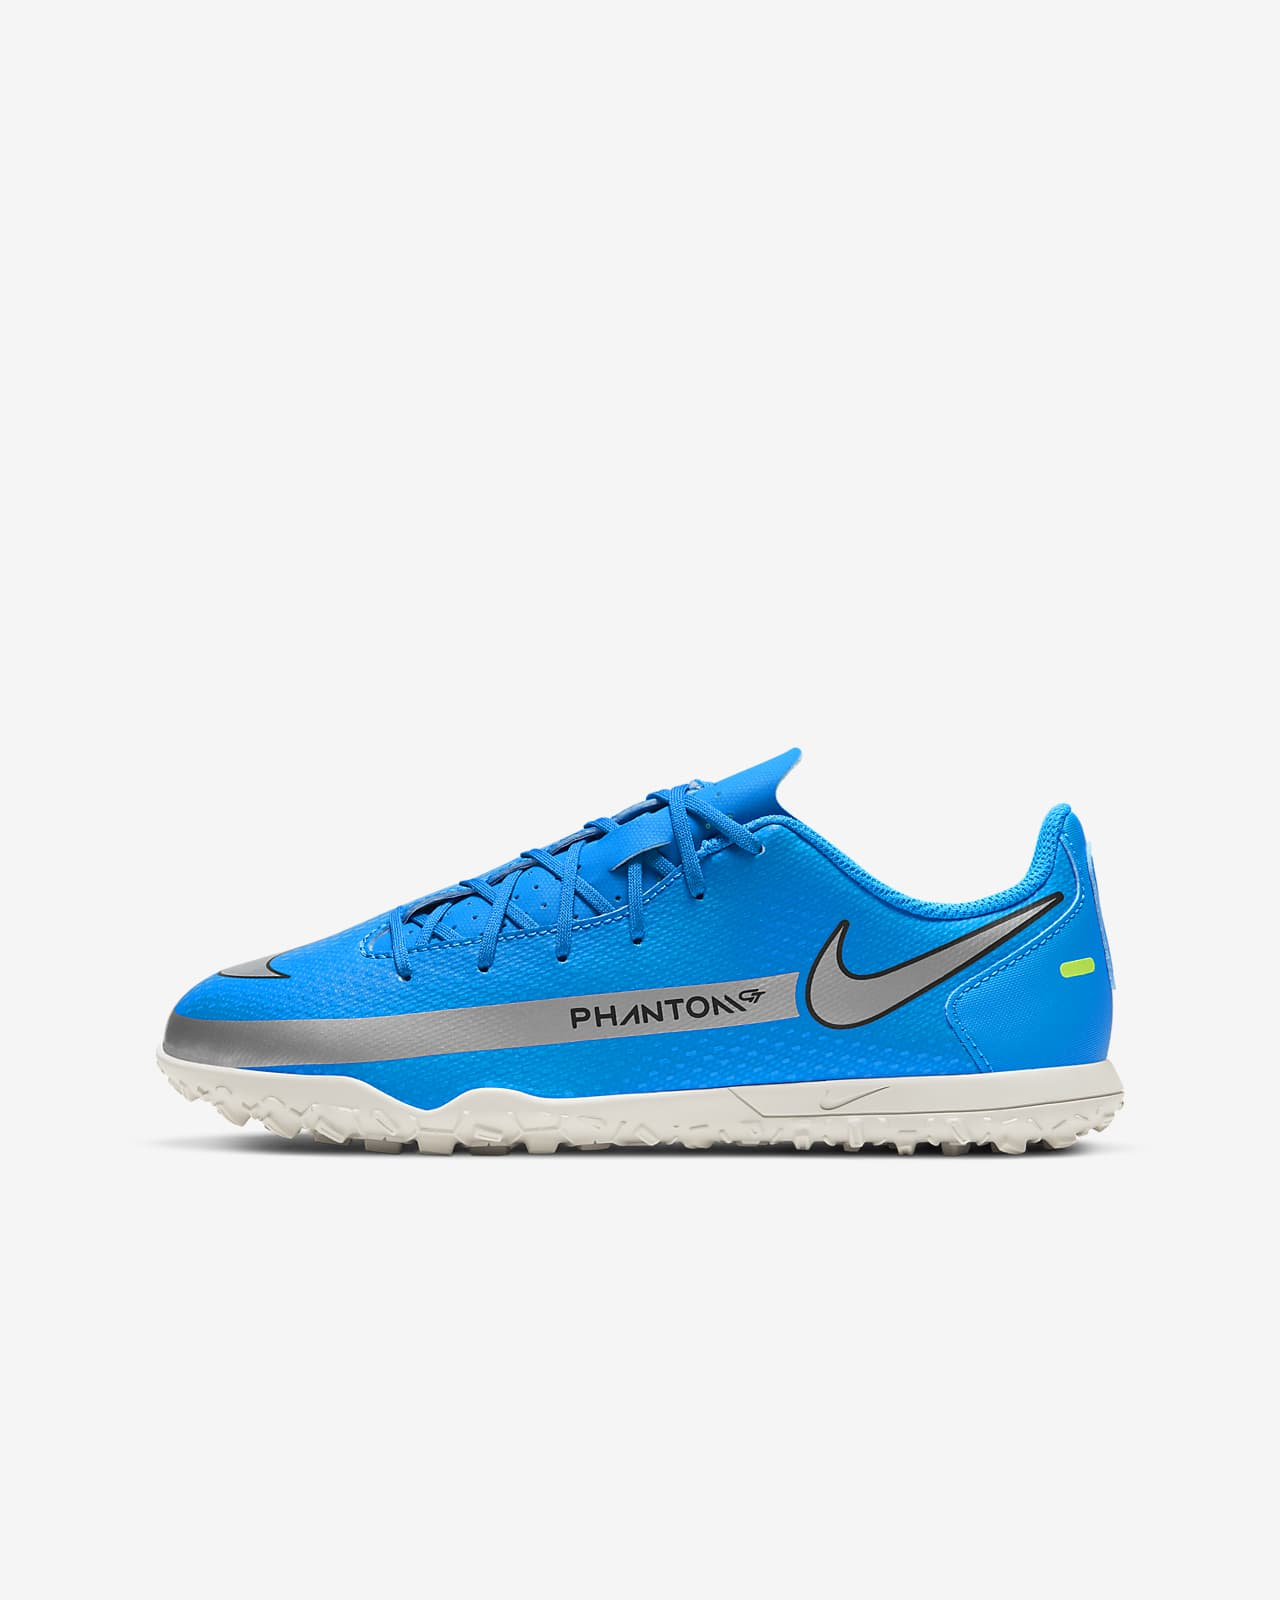 Nike Jr. Phantom GT Club TF Younger/Older Kids' Artificial-Turf Football Shoe